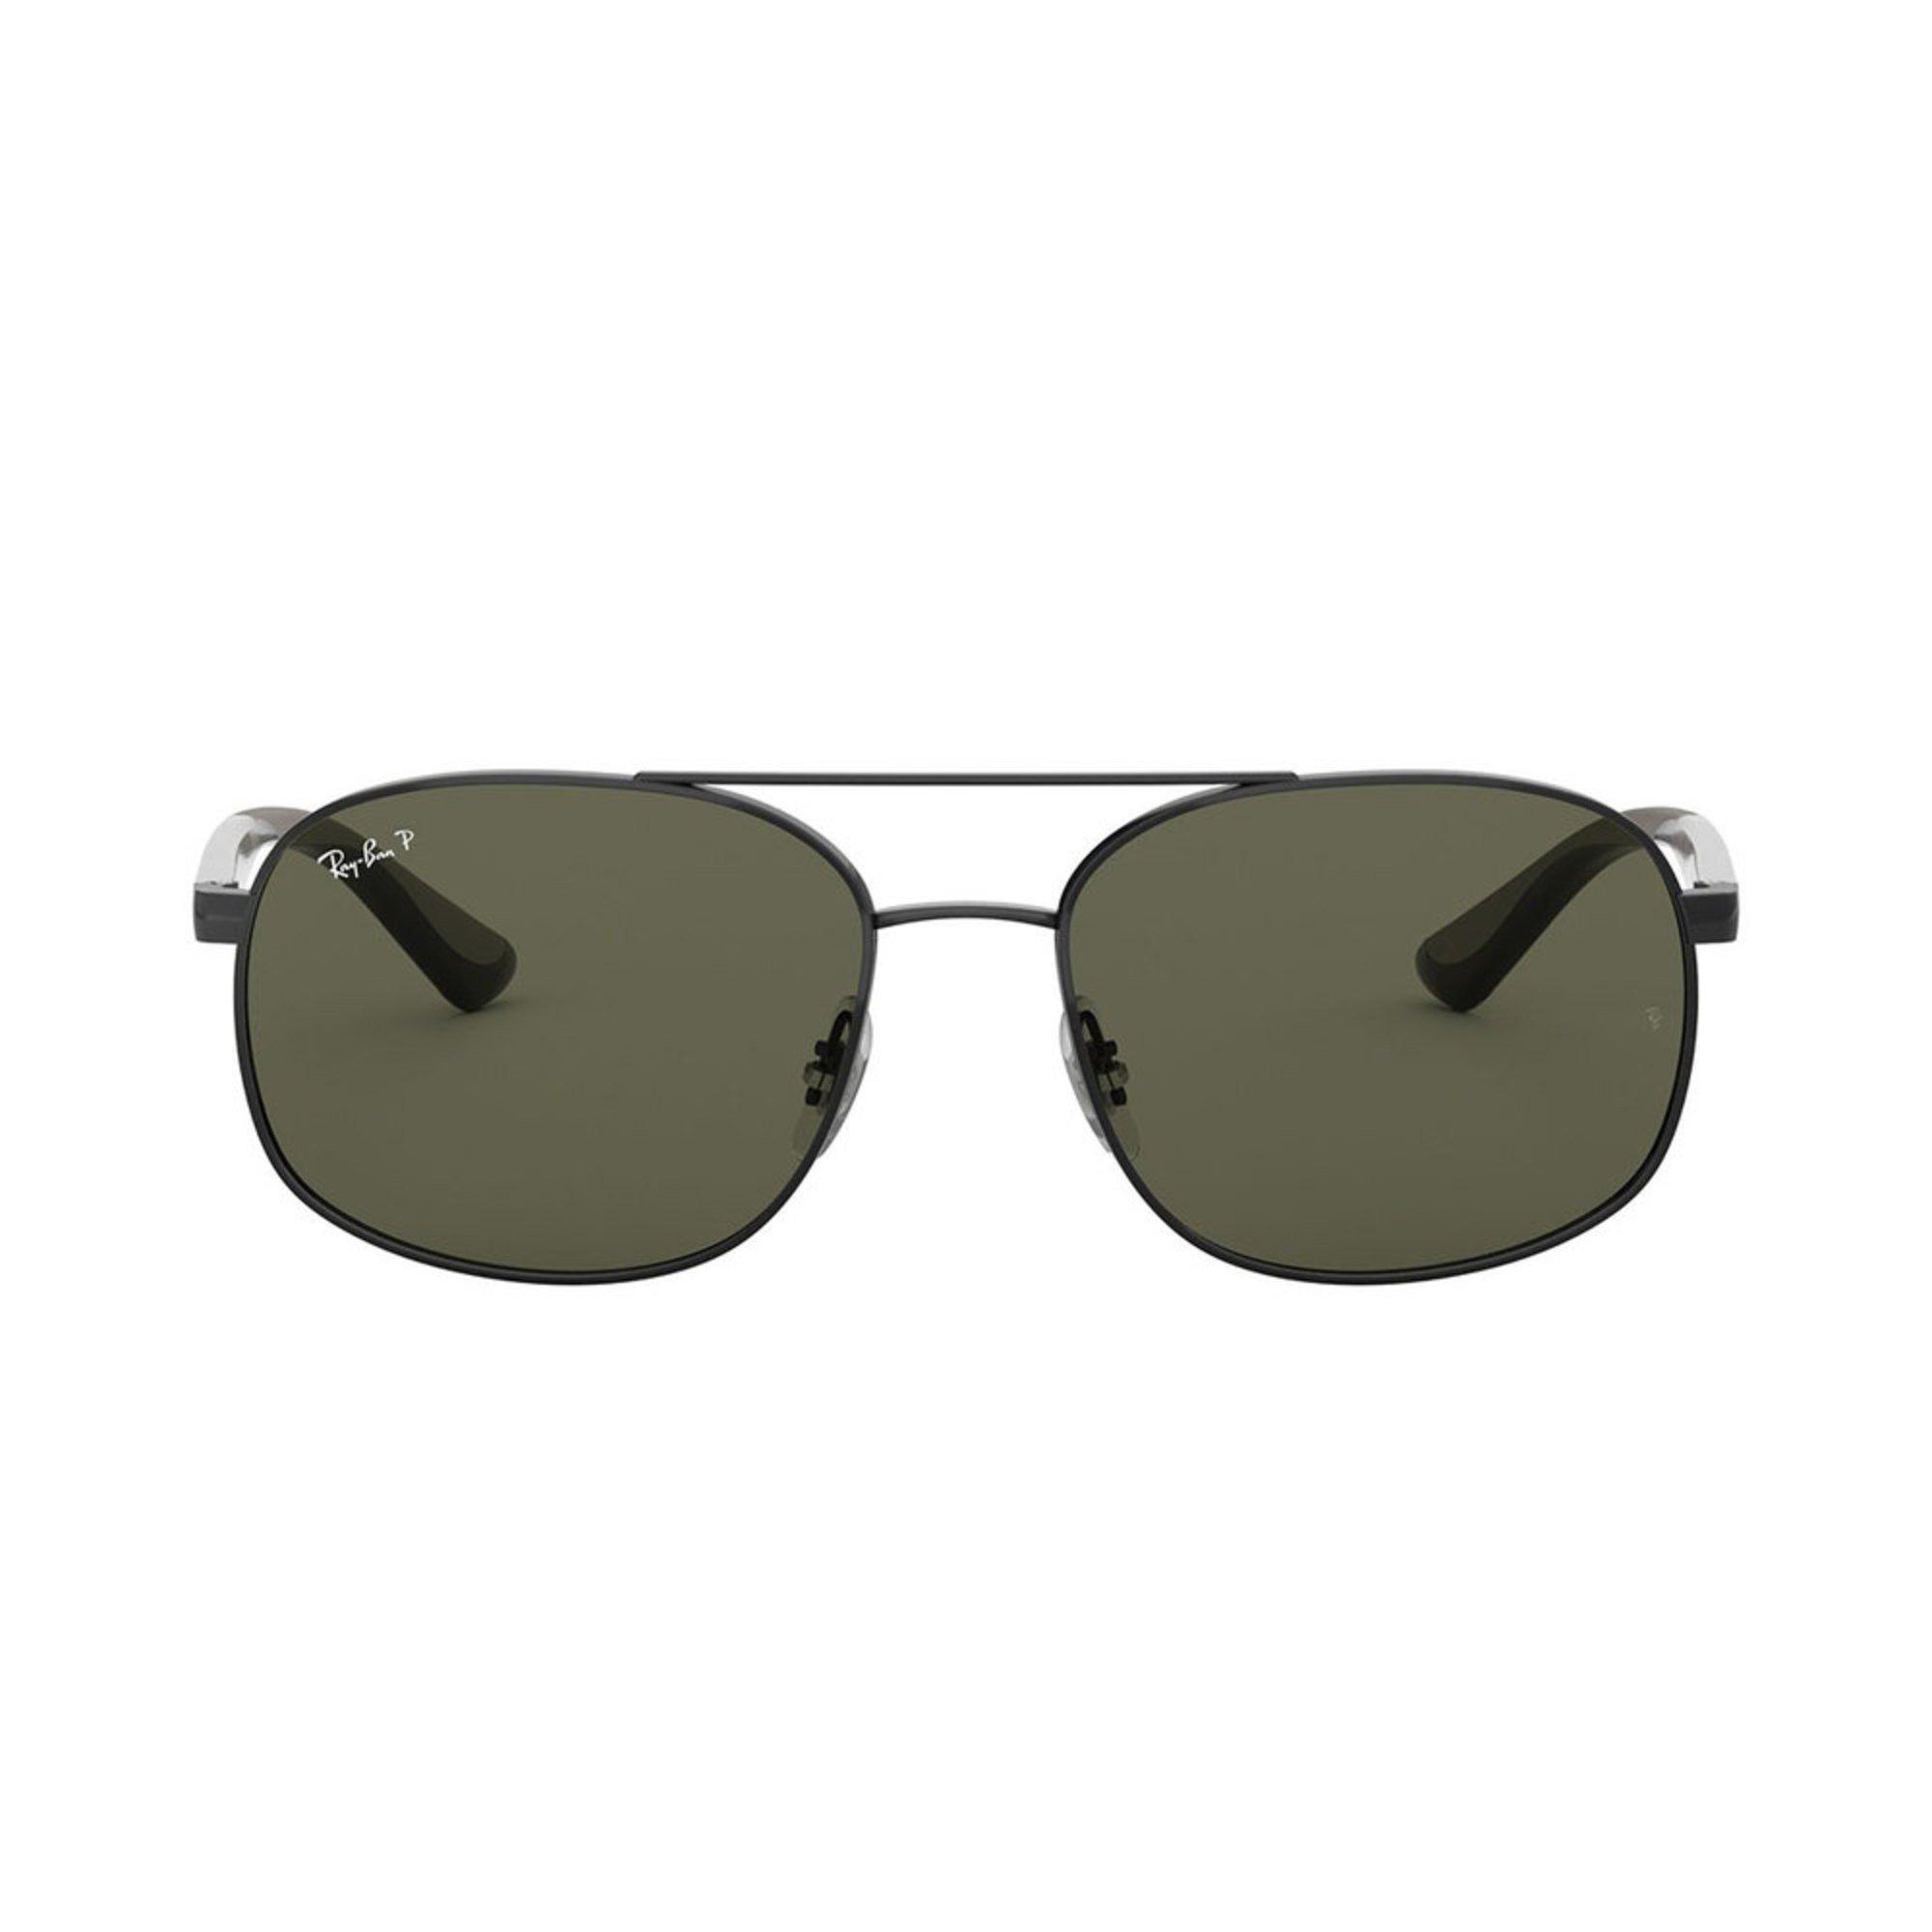 c562d4b03ed Ray-Ban. Ray-Ban Men s Polarized Square Sunglasses